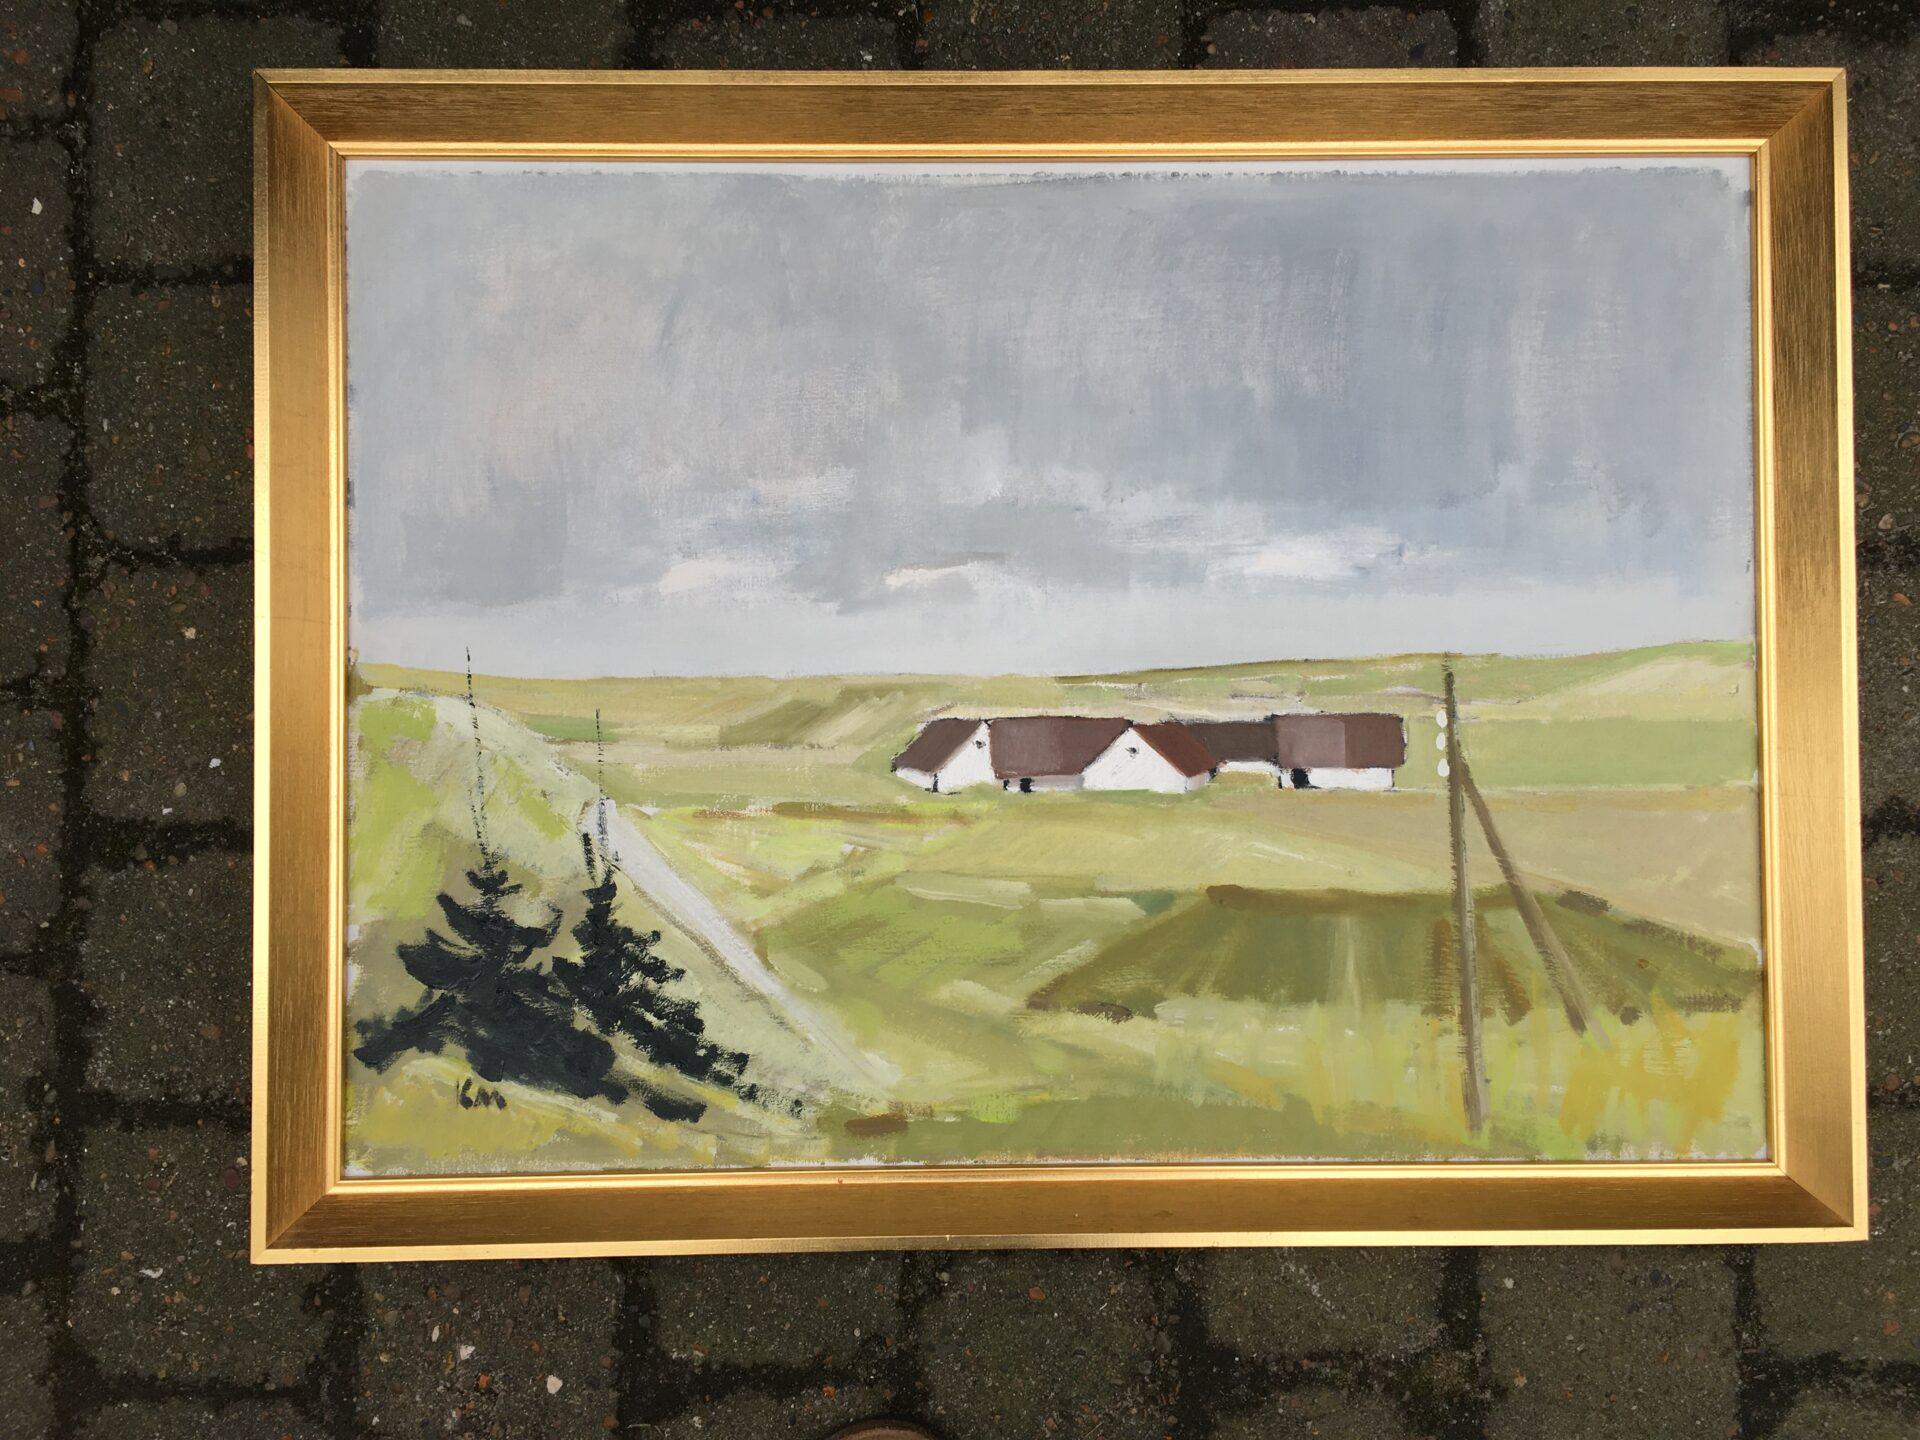 Karsten Hallberg Møller, oliemaleri, rammemål 55x77 cm, pris 500kr